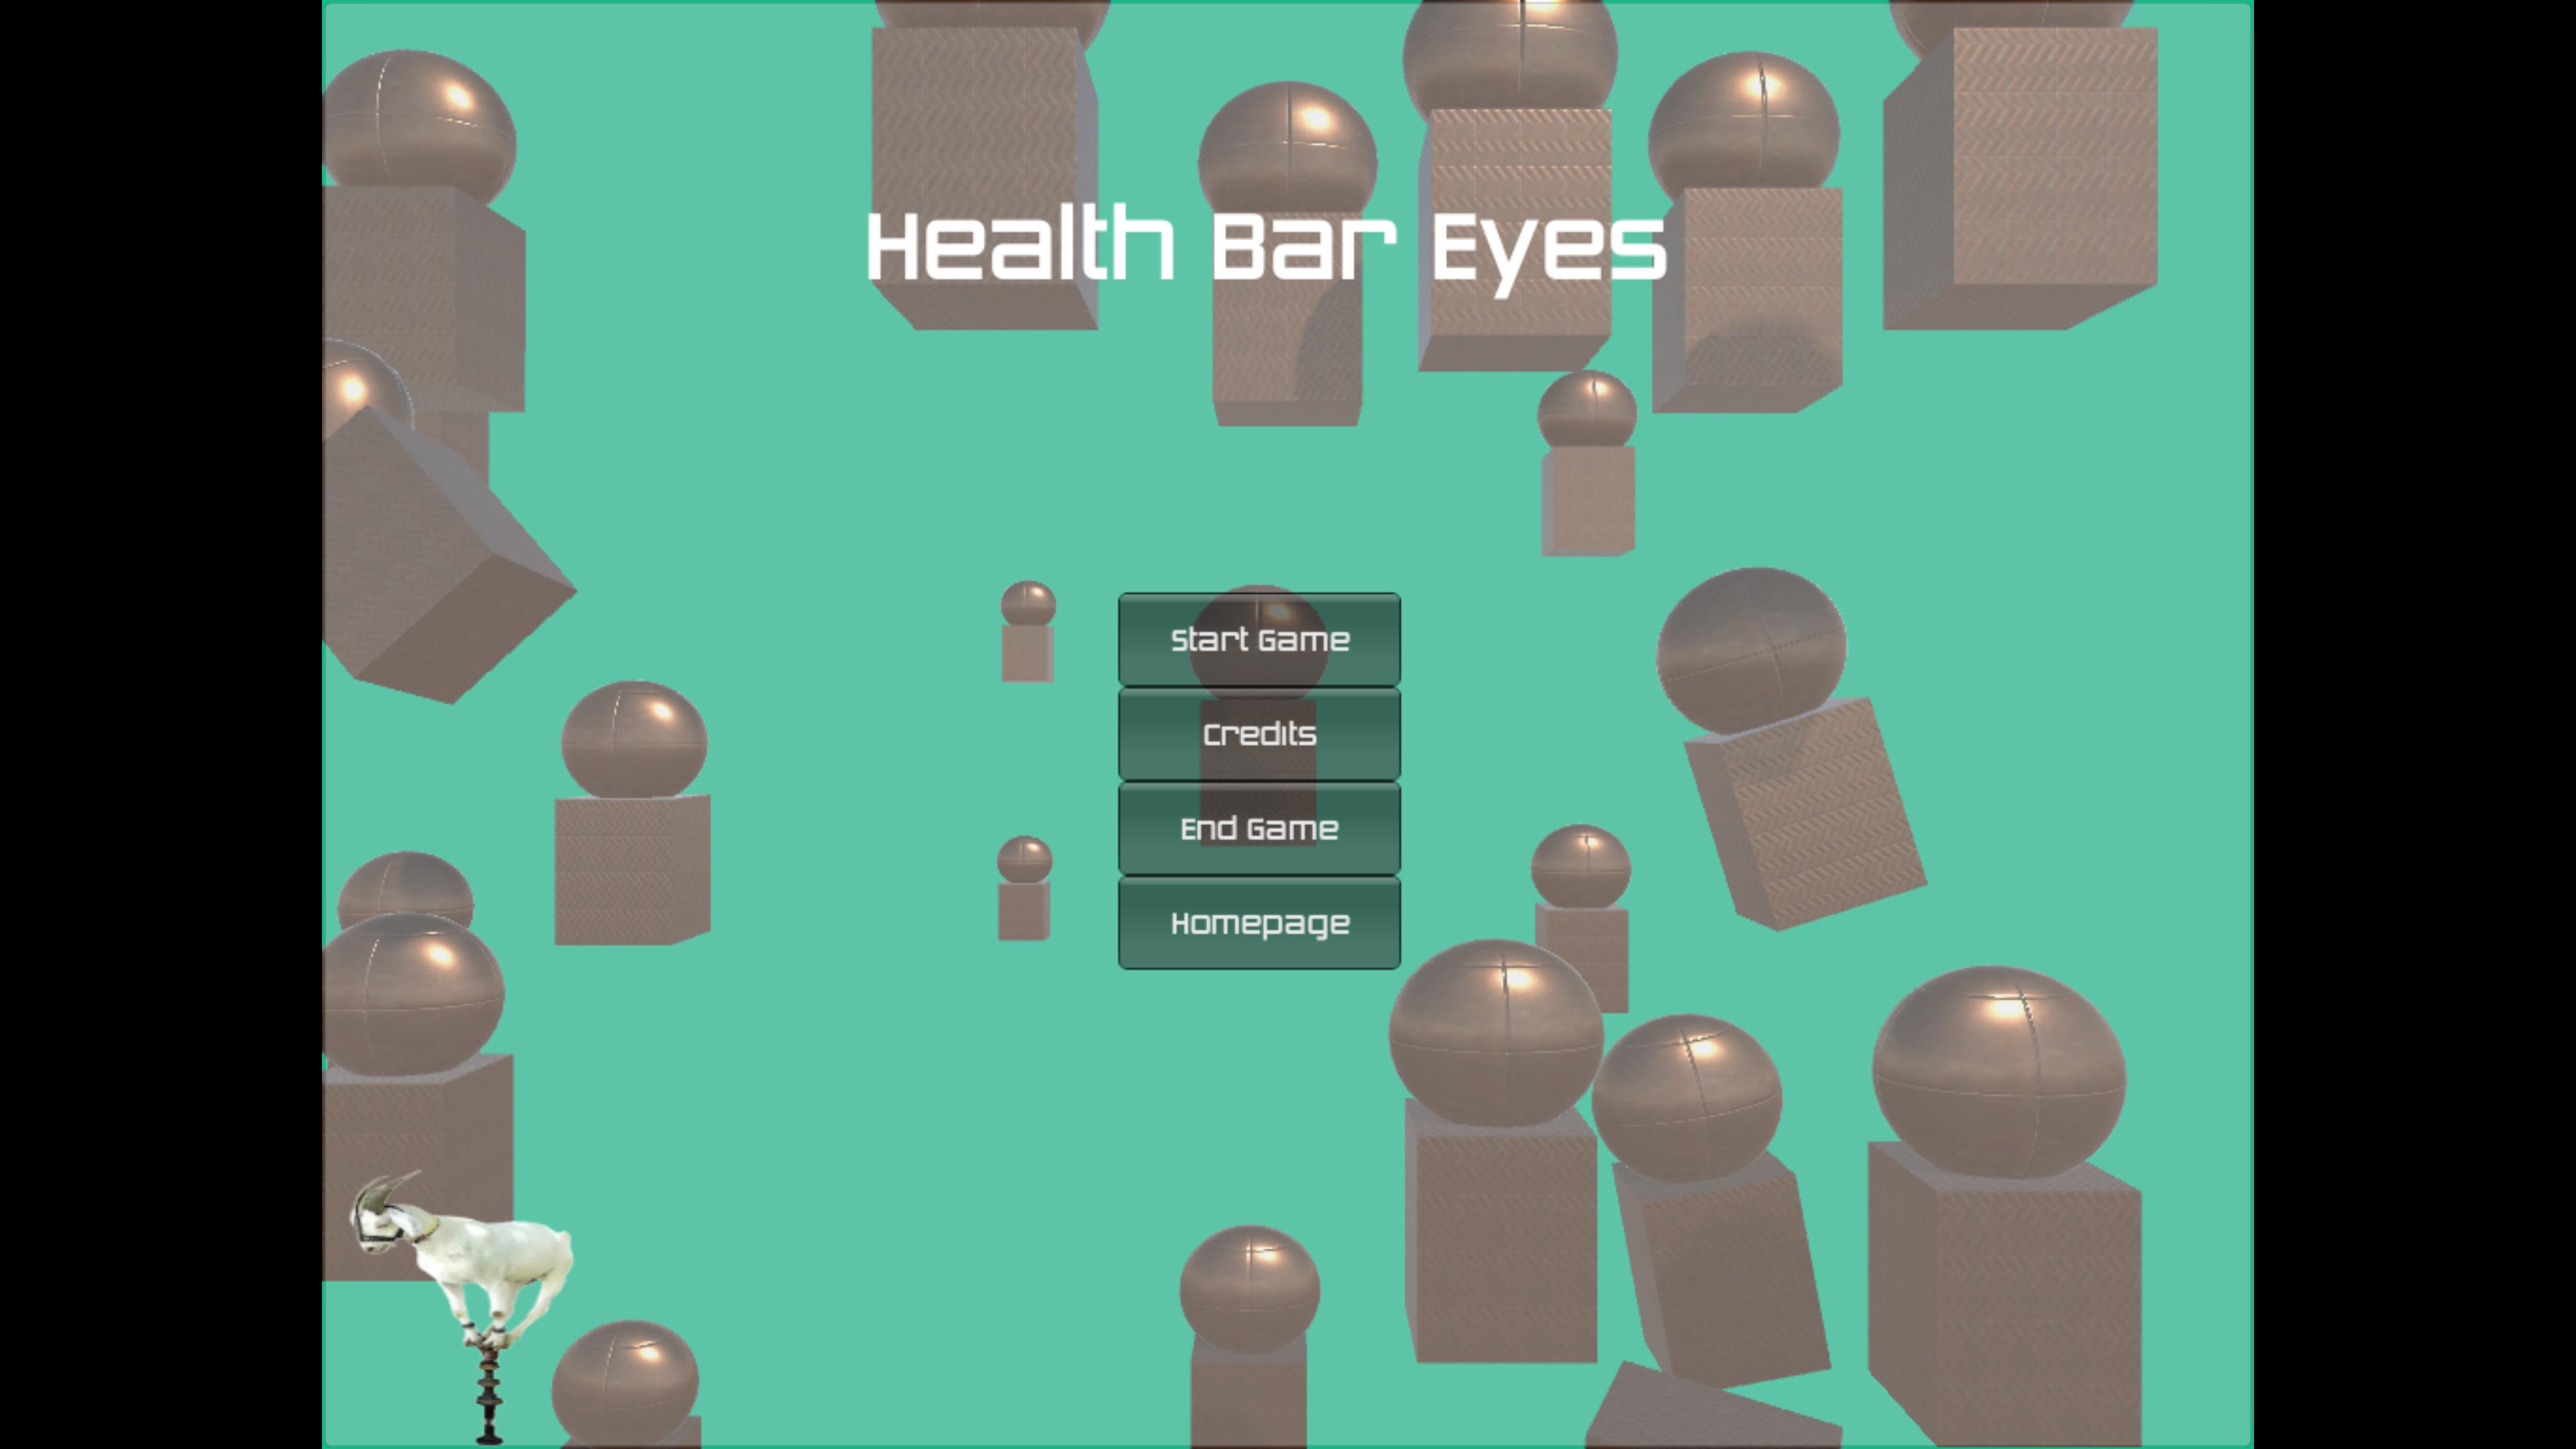 Health Bar Eyes